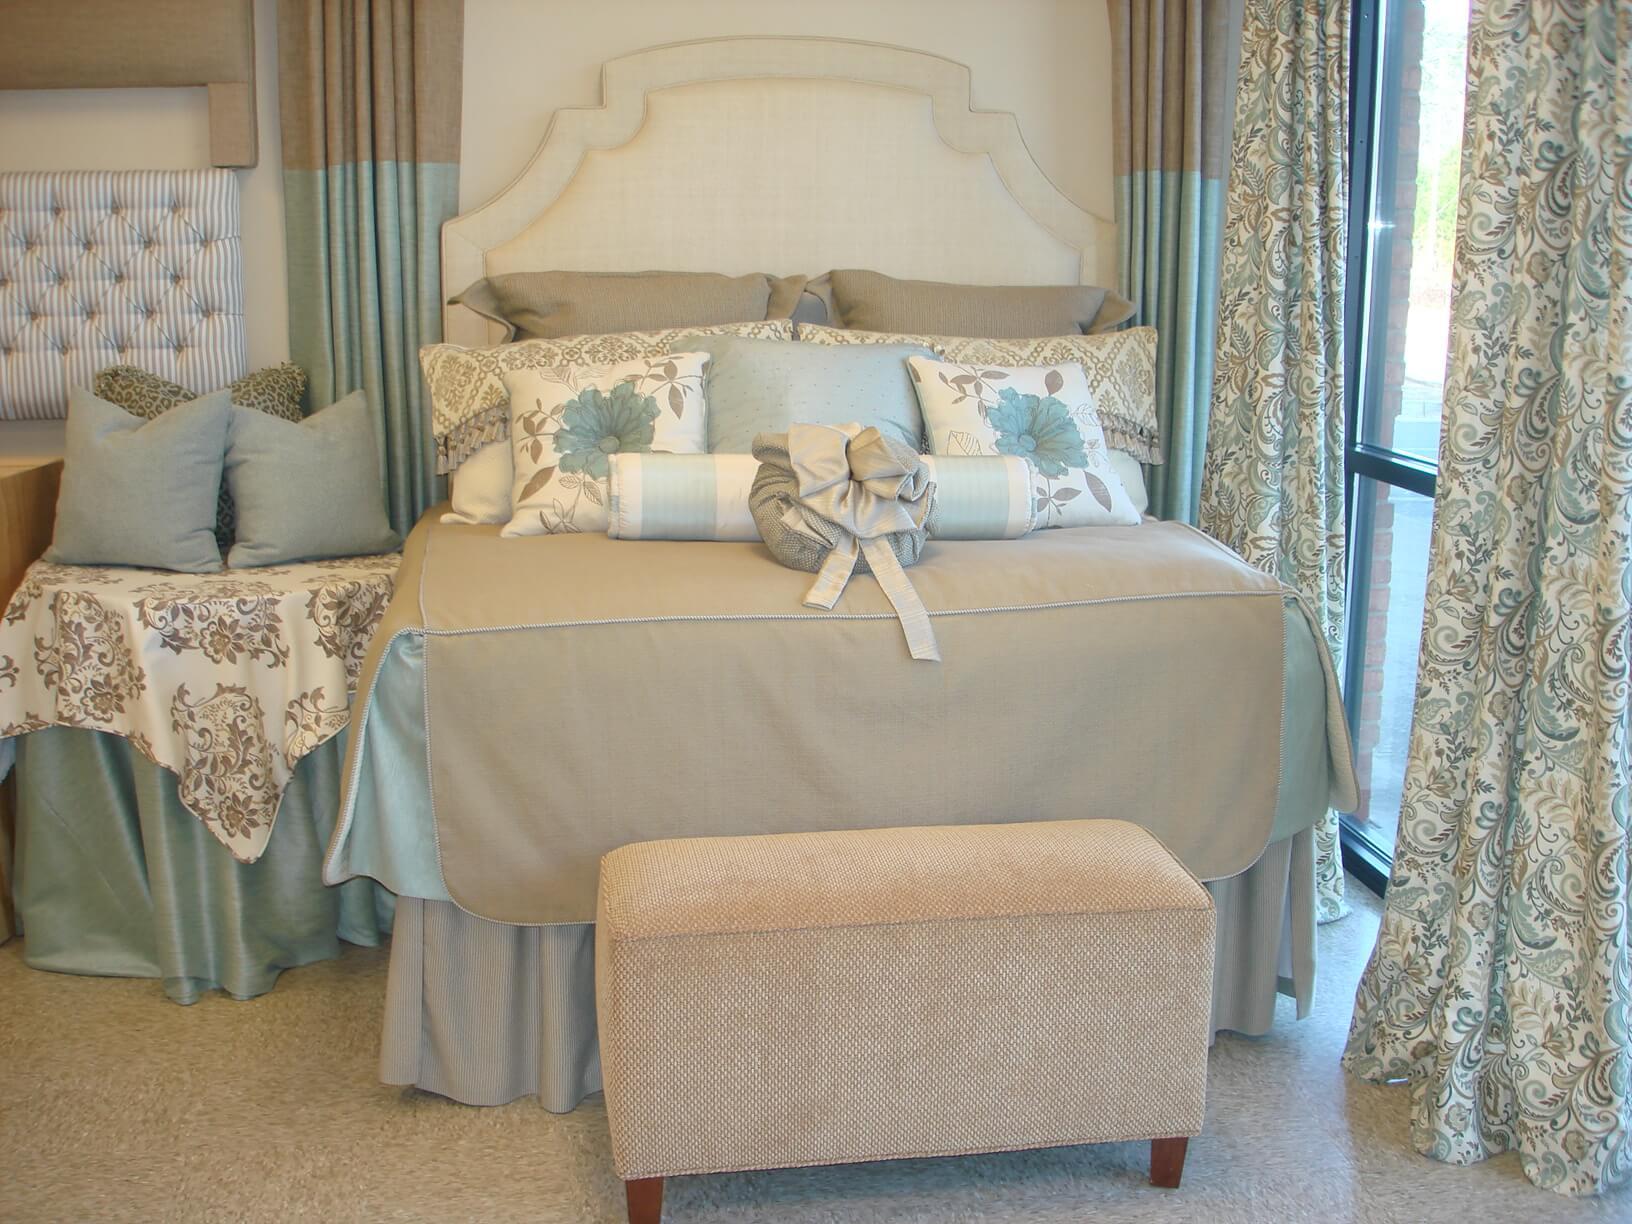 custom-bedding-linens-fabric-atlanta-georgia-6.JPG